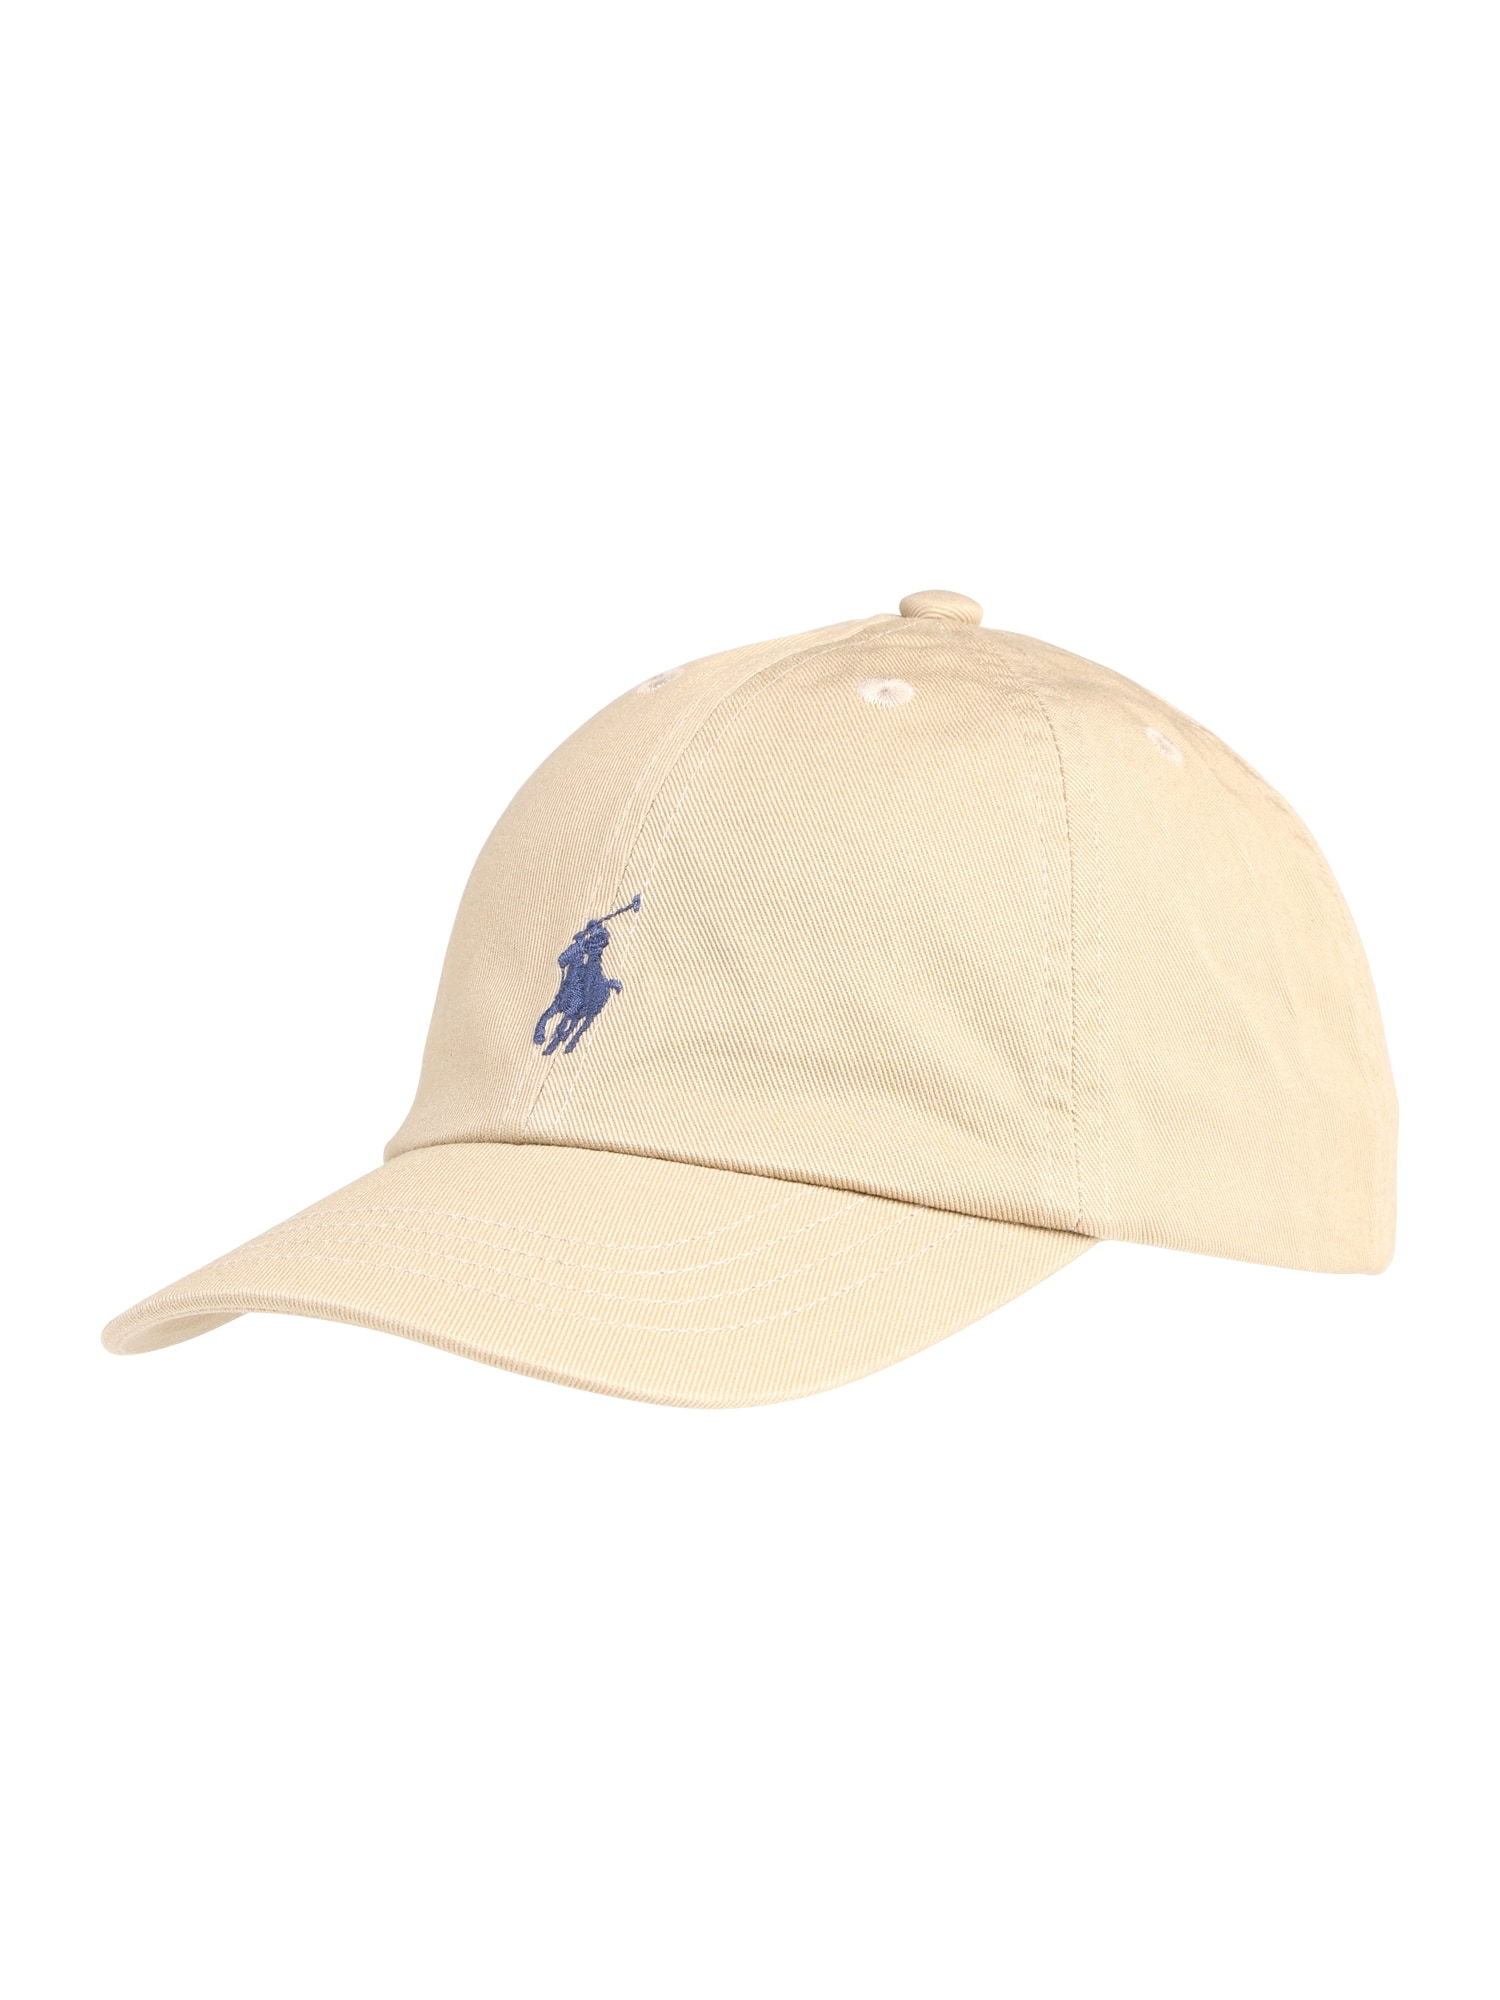 Klobouk COTTON-CLSC CAP-AC-HAT khaki POLO RALPH LAUREN